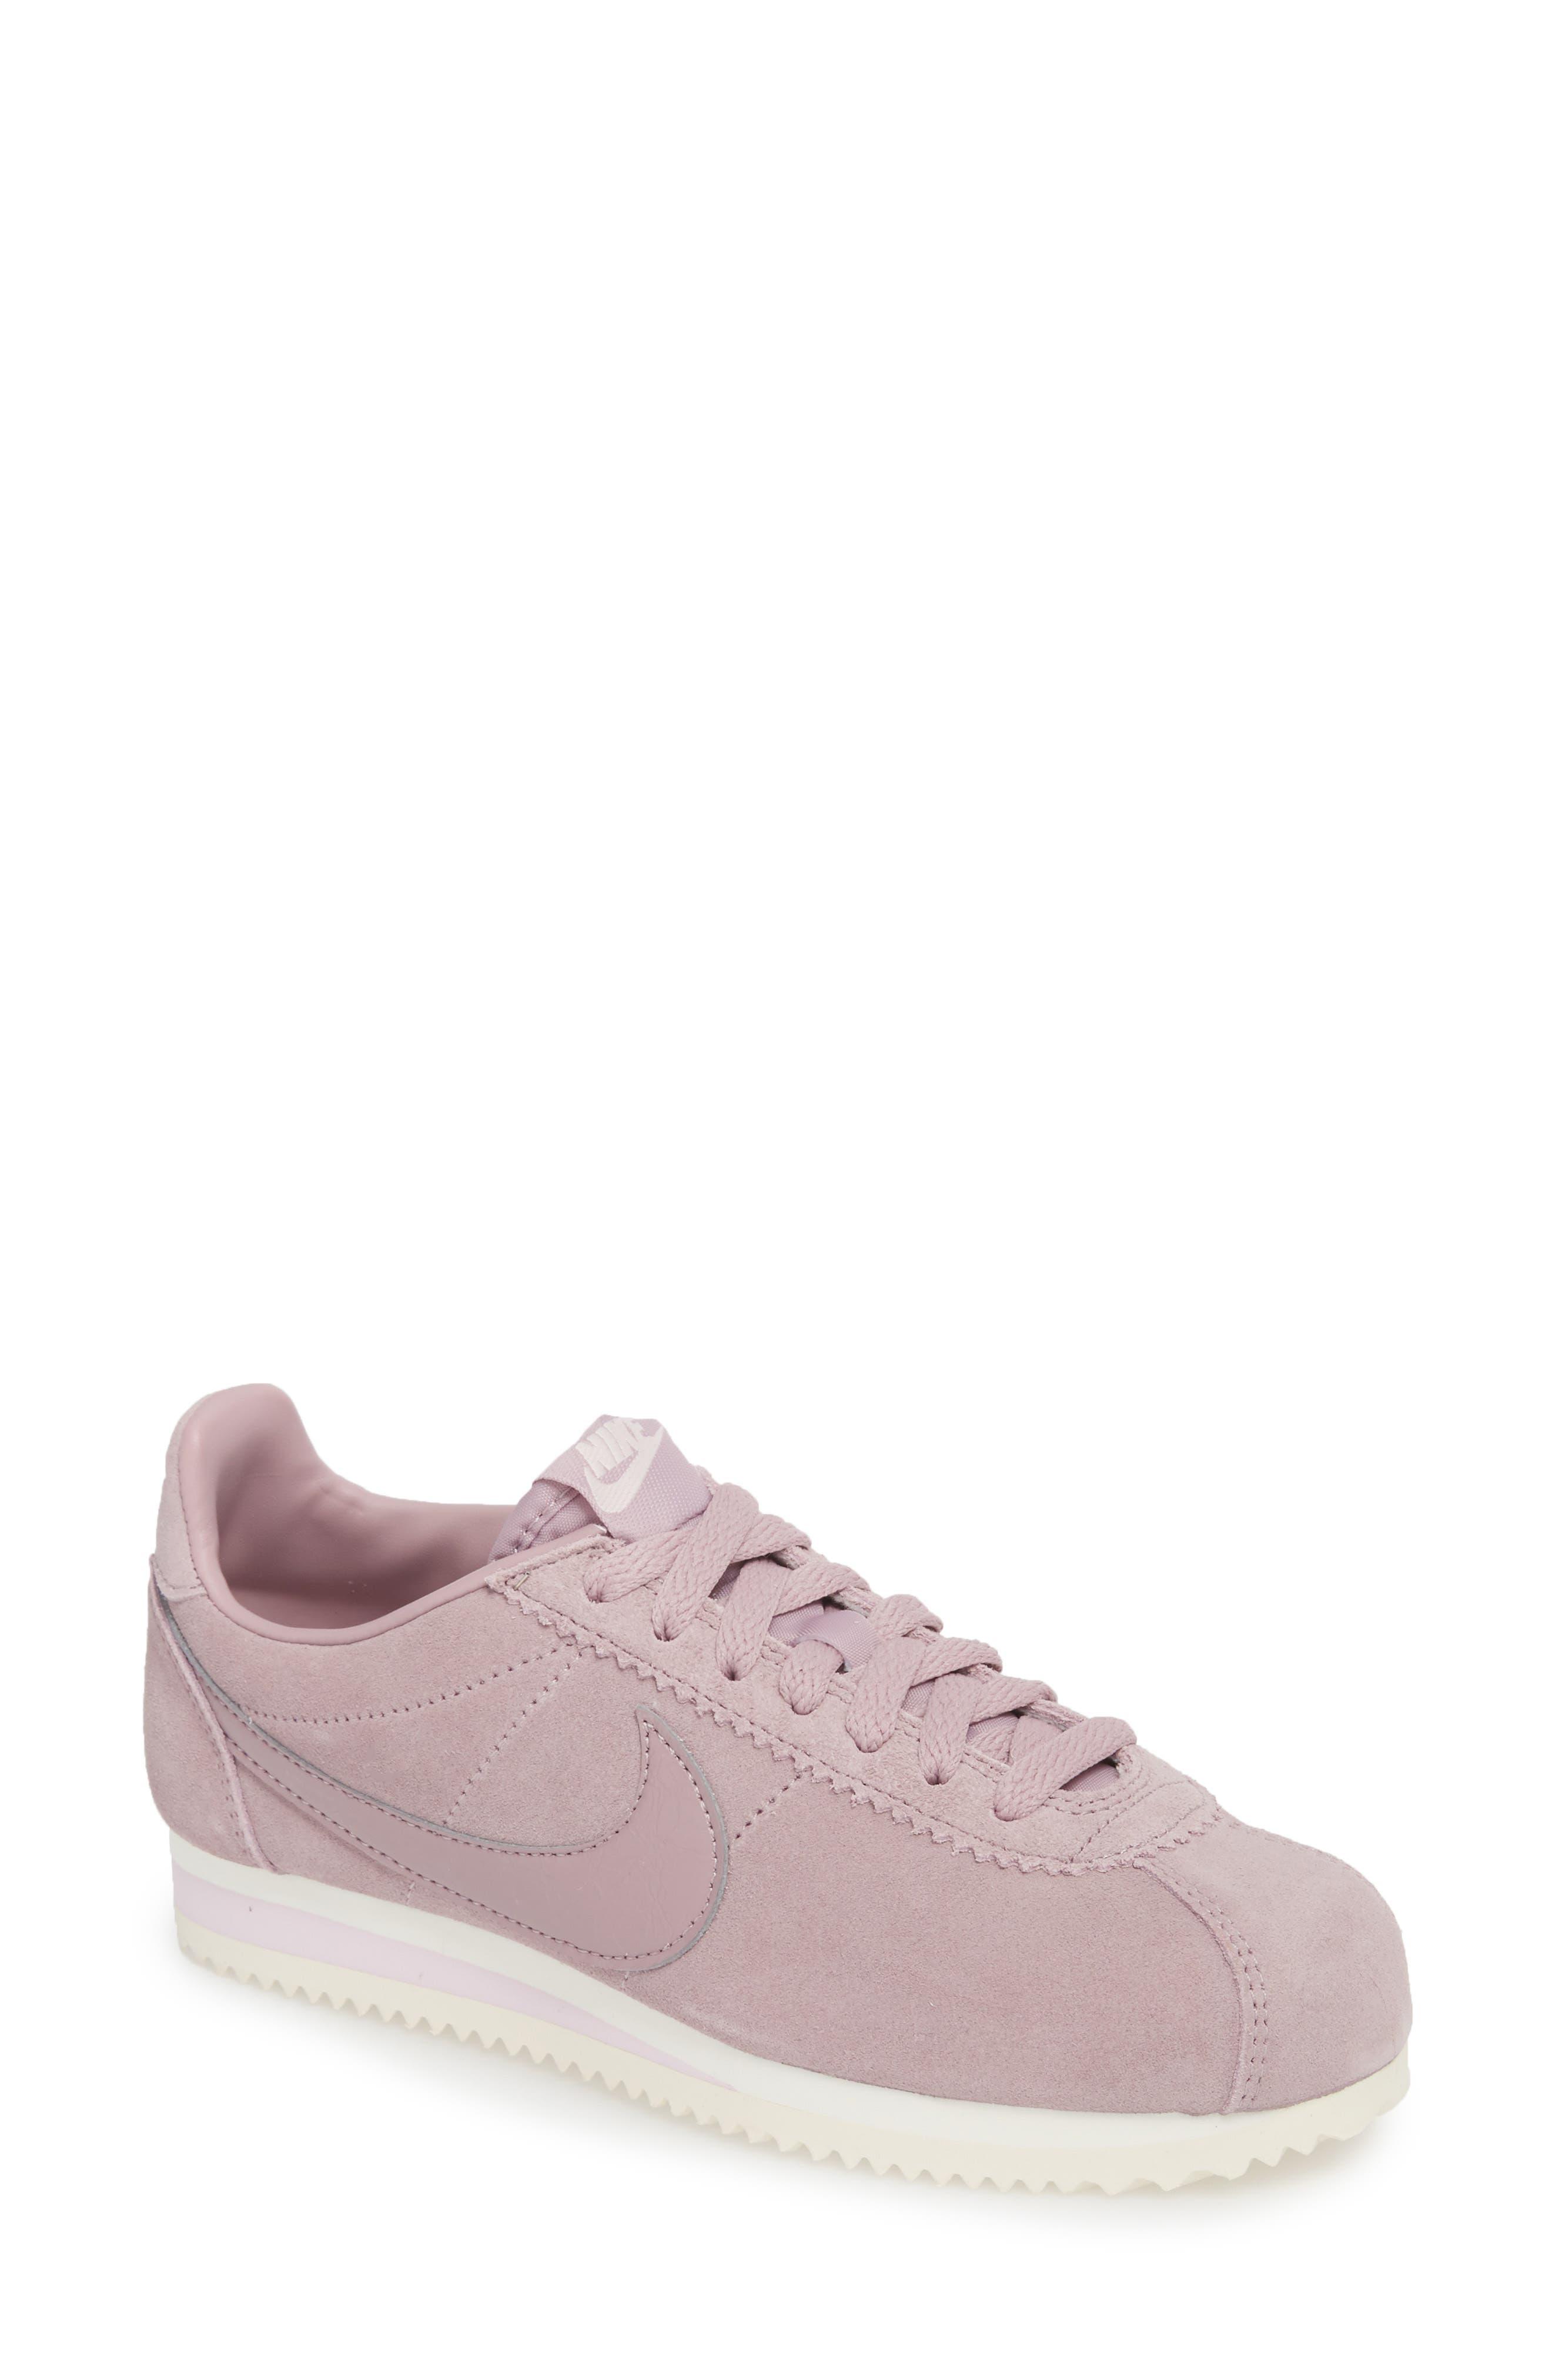 Classic Cortez Suede Sneaker,                             Main thumbnail 1, color,                             Elemental Rose/ Elemental Rose